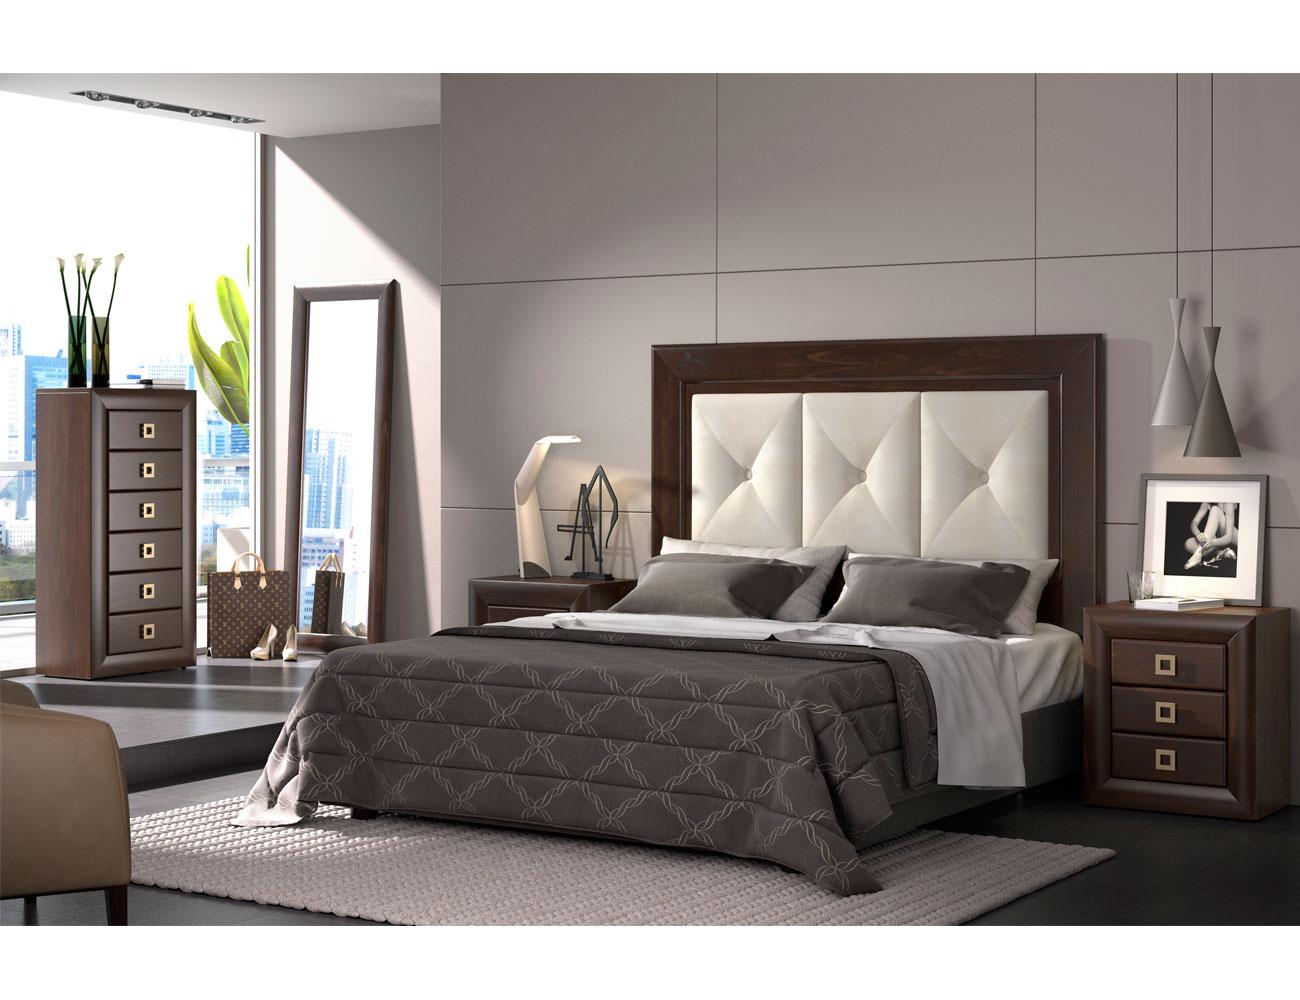 Dormitorio matrimonio nogal tapizado